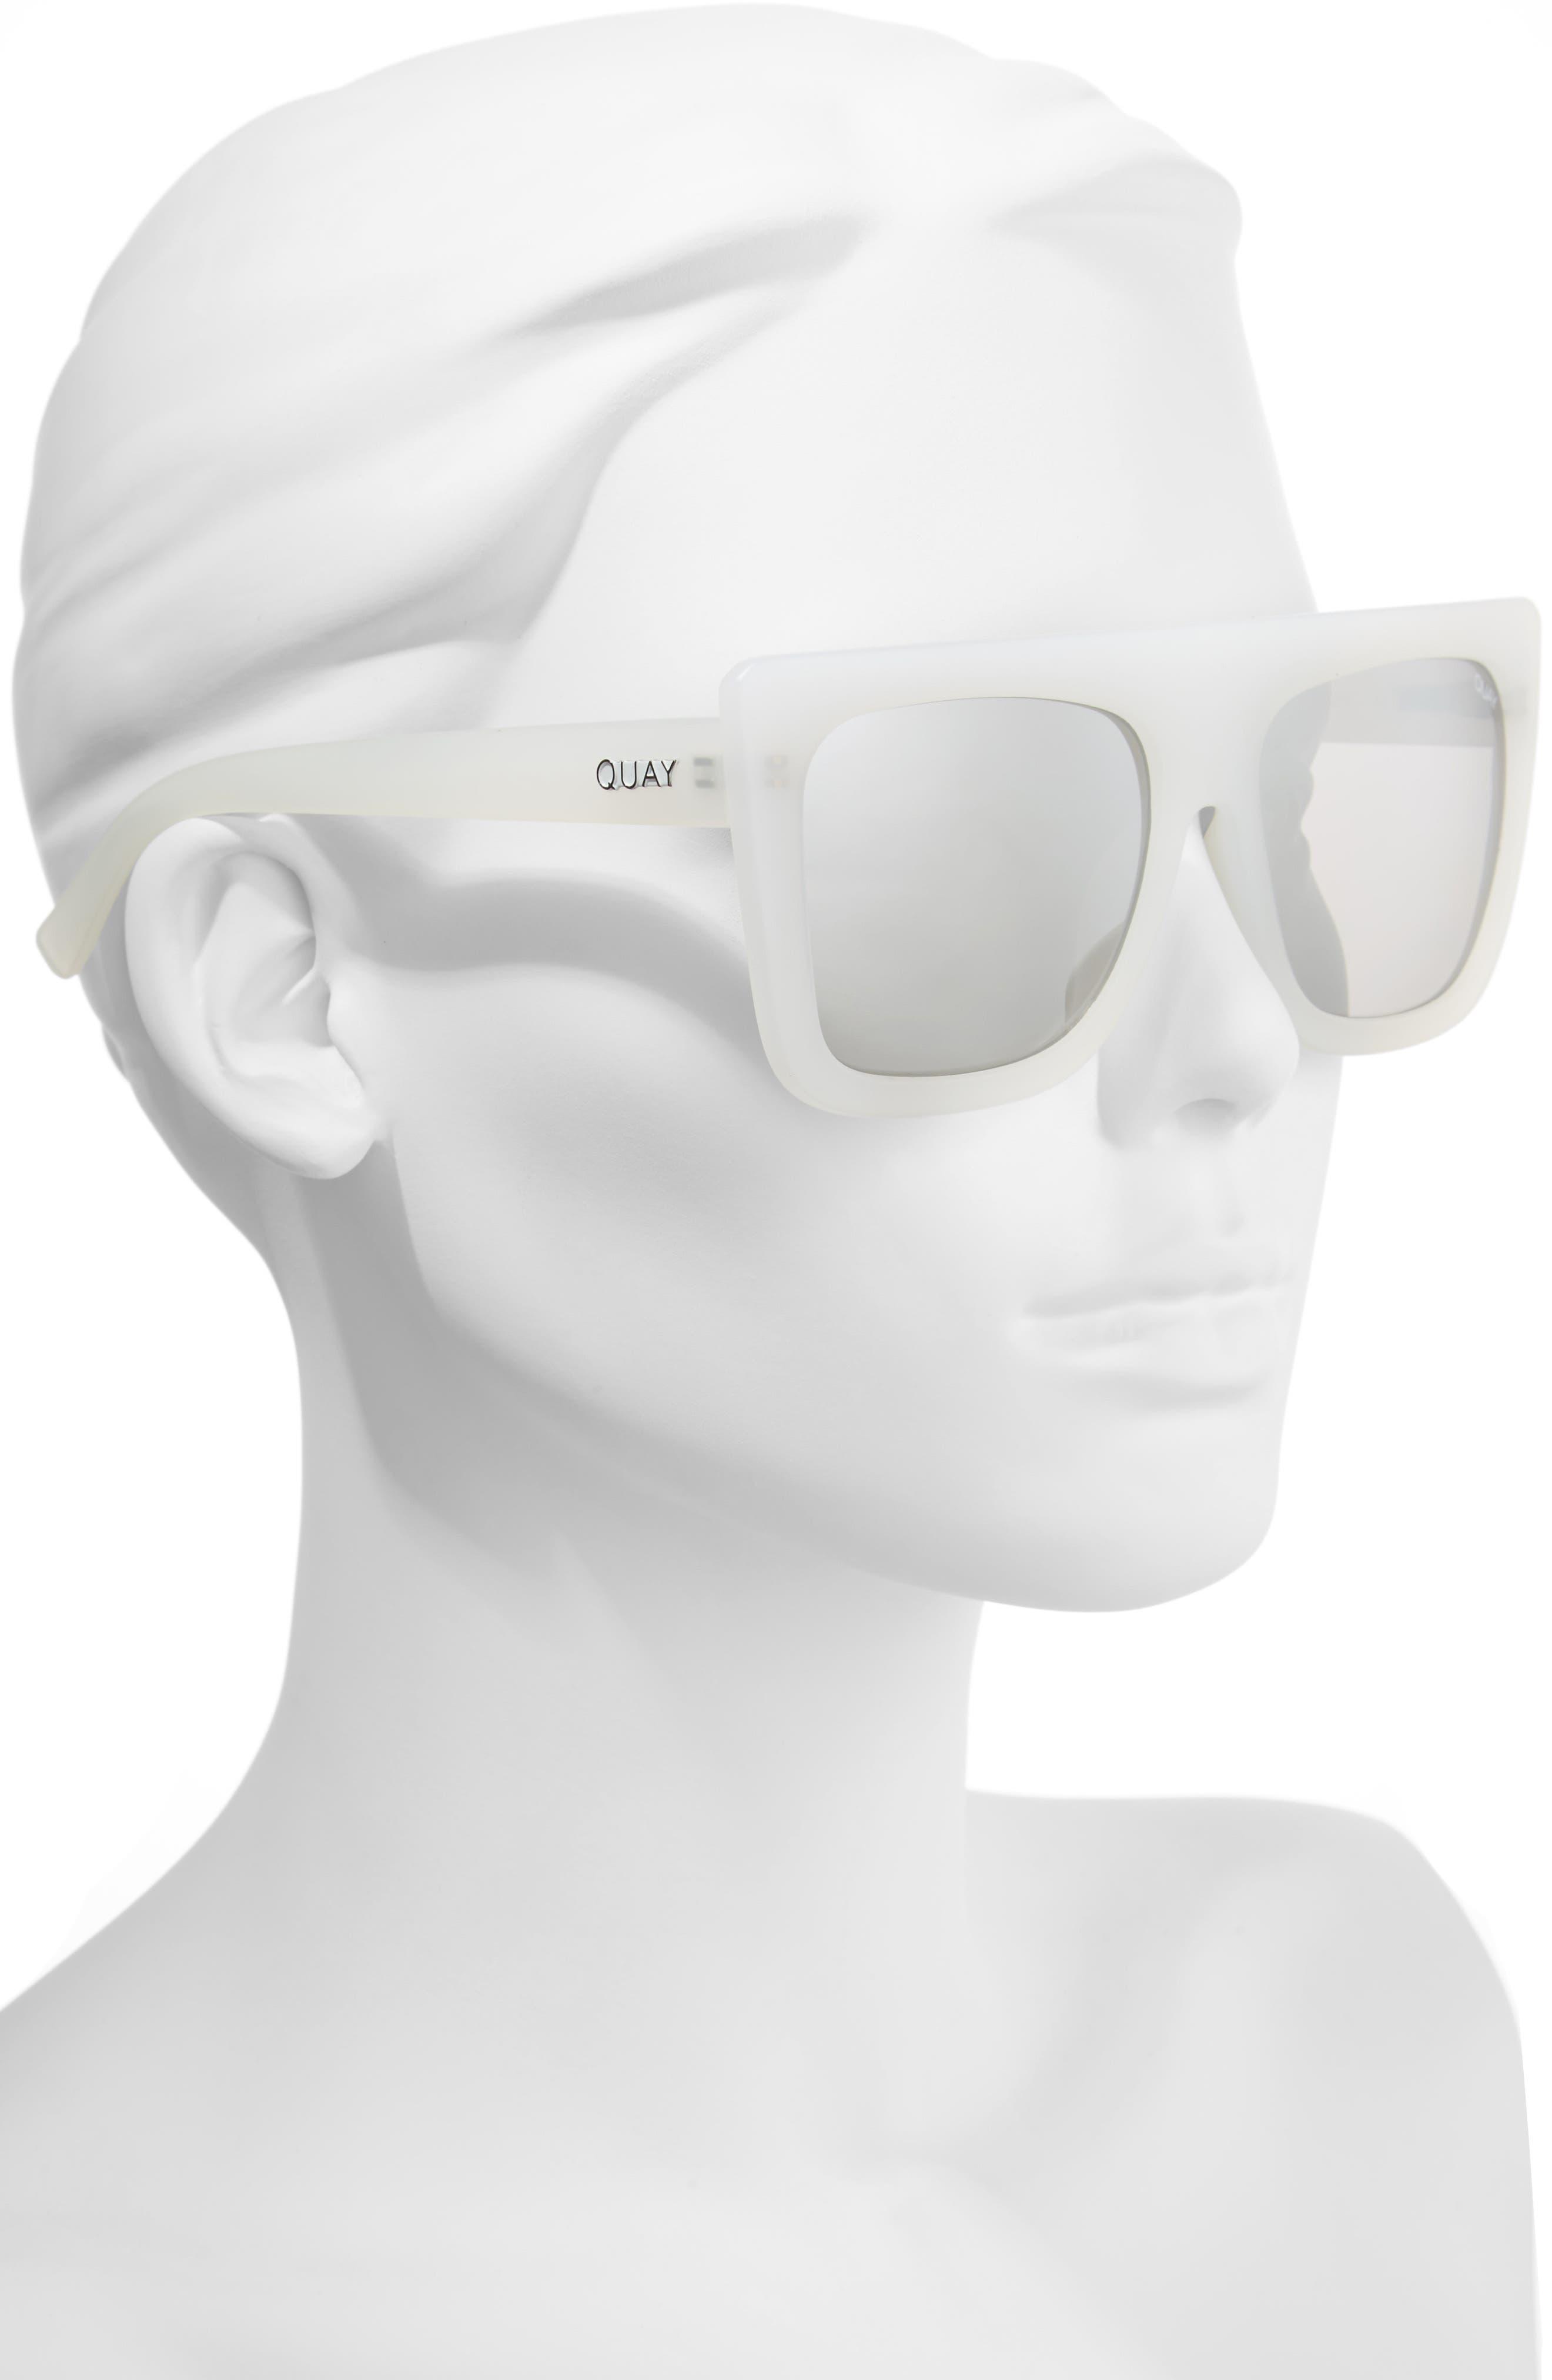 Cafe Racer 60mm Sunglasses,                             Alternate thumbnail 2, color,                             White Silver